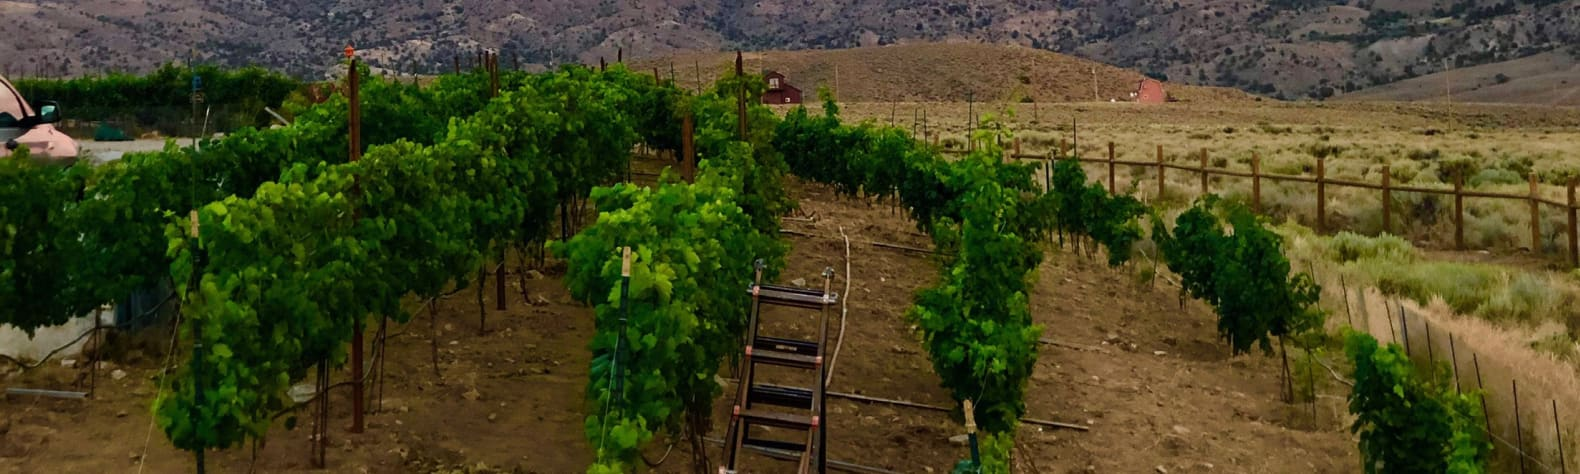 VintageTrailer Vineyard